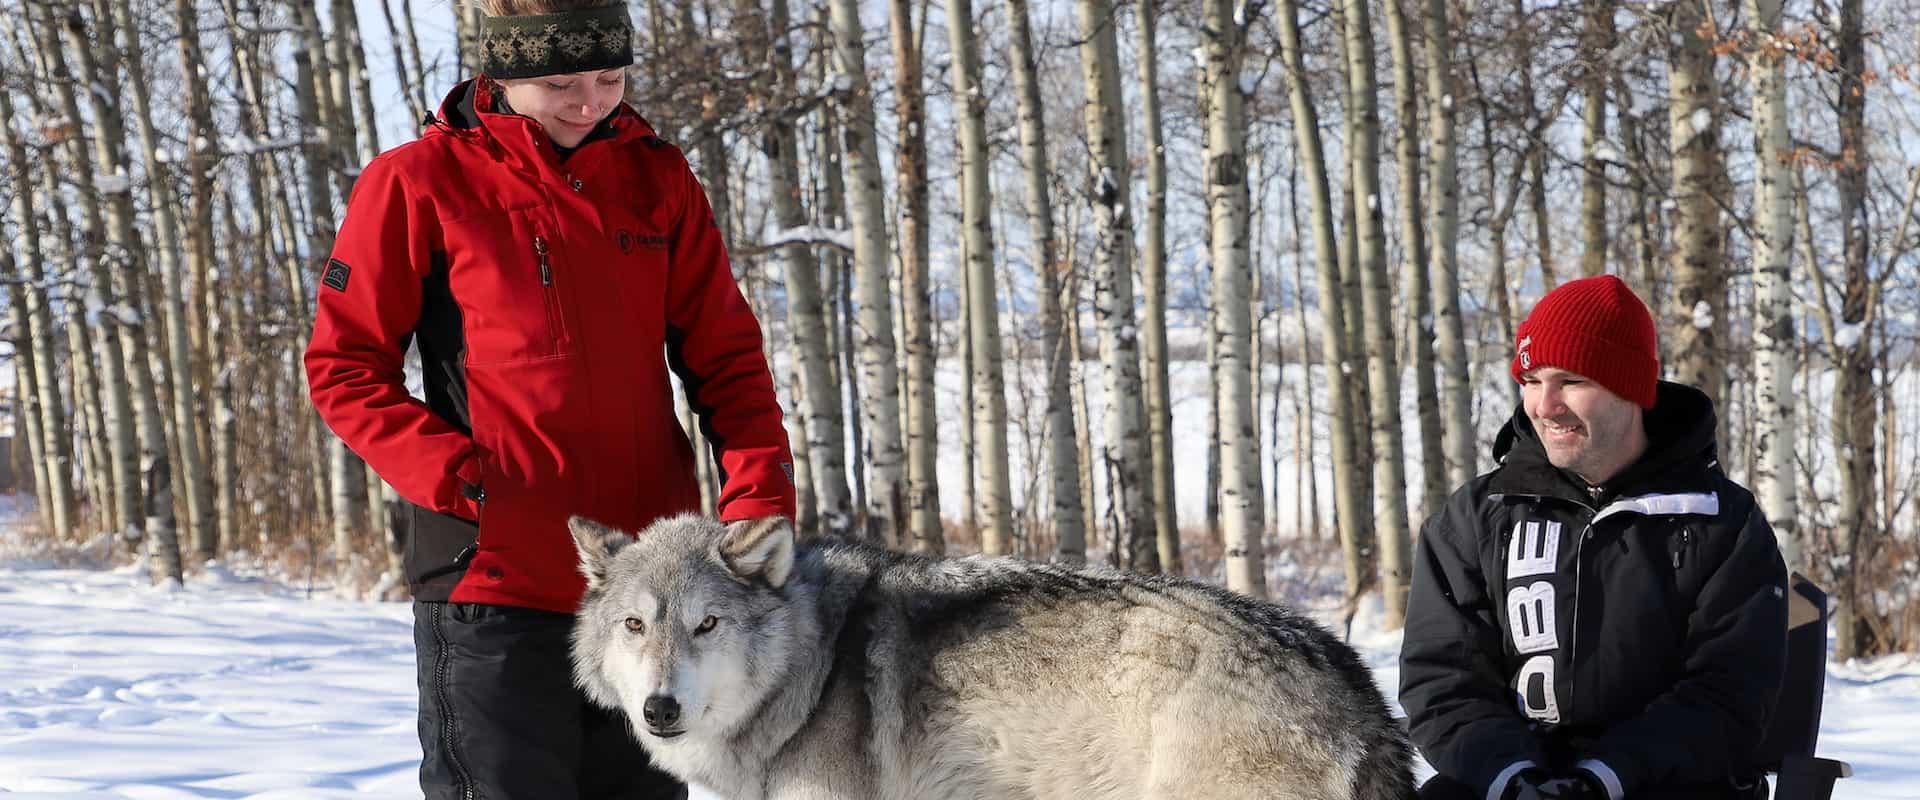 Meet wolfdogs on the interactive tour at the Yamnuska Wolfdog Sanctuary